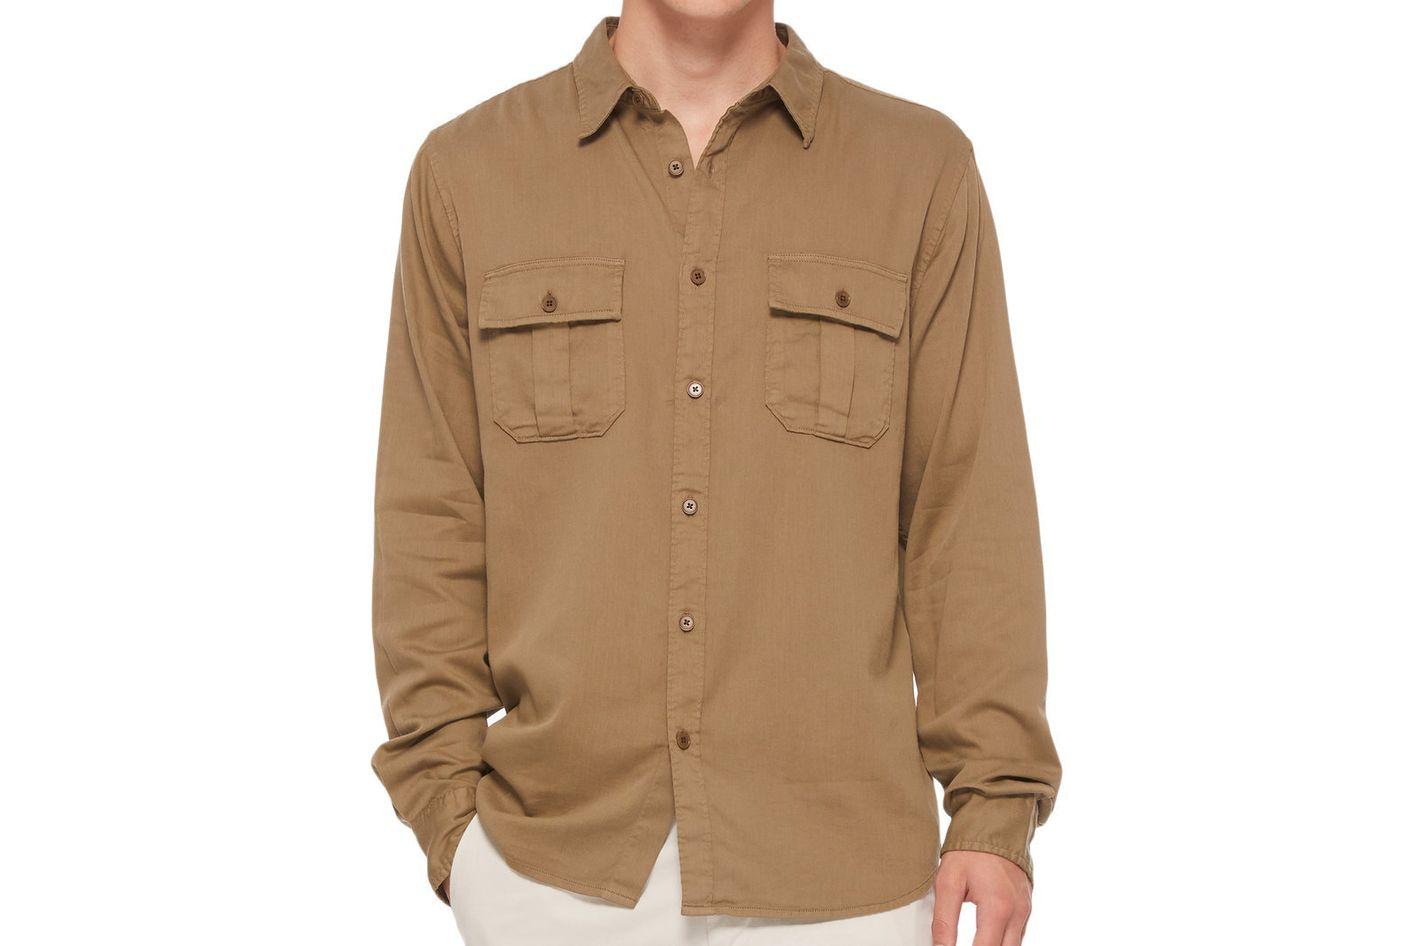 Frame Denim Slouchy Cotton-Blend Work Shirt